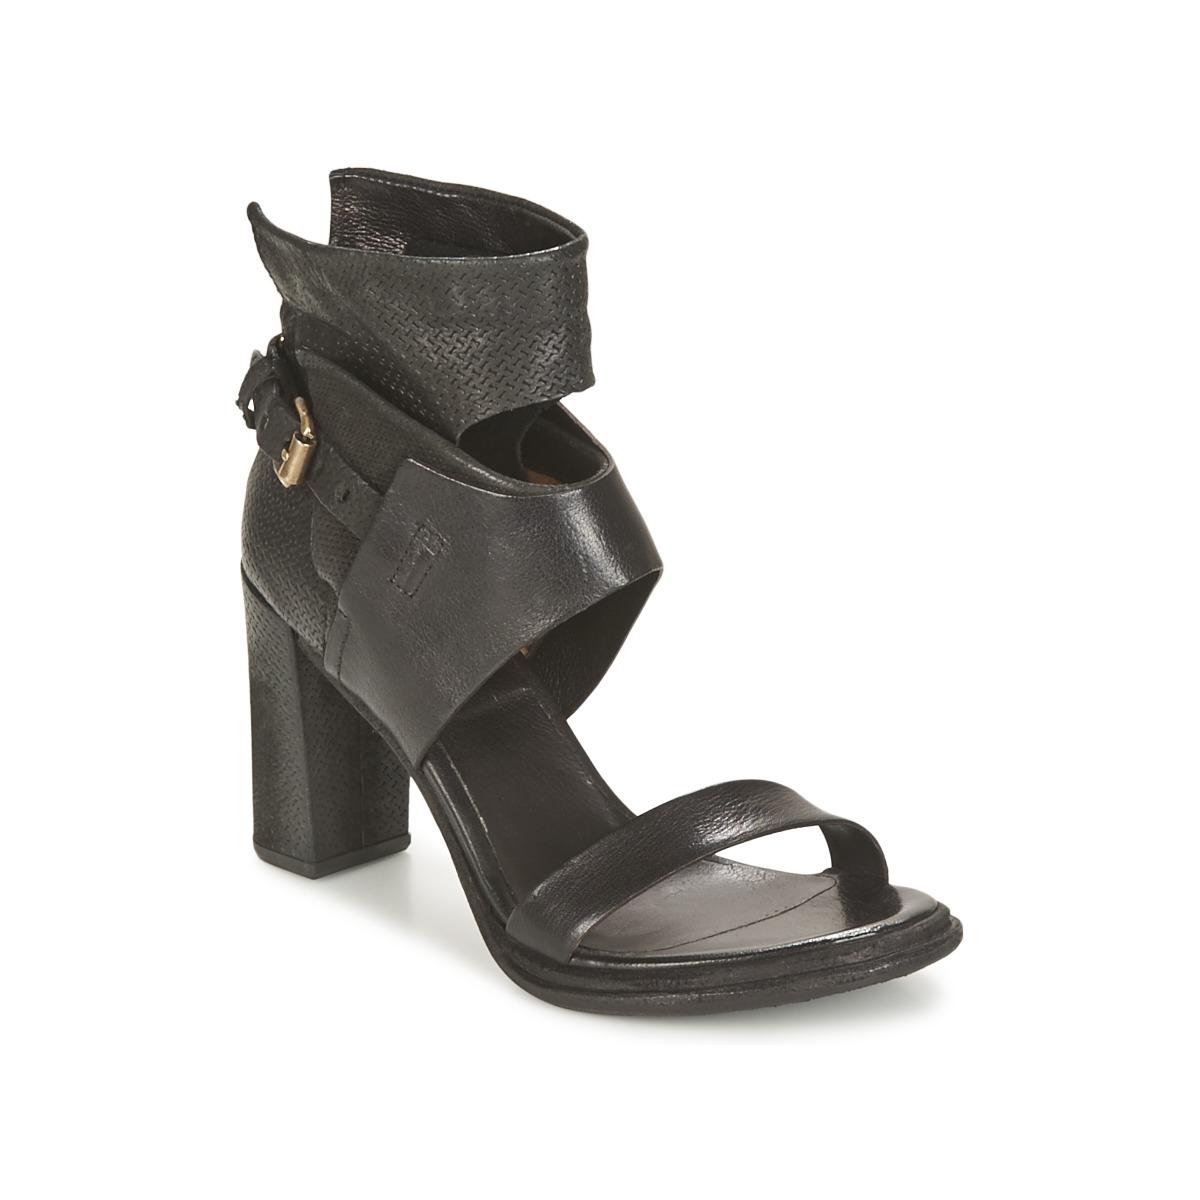 Sandaalit Airstep / A.S.98 IRON Black